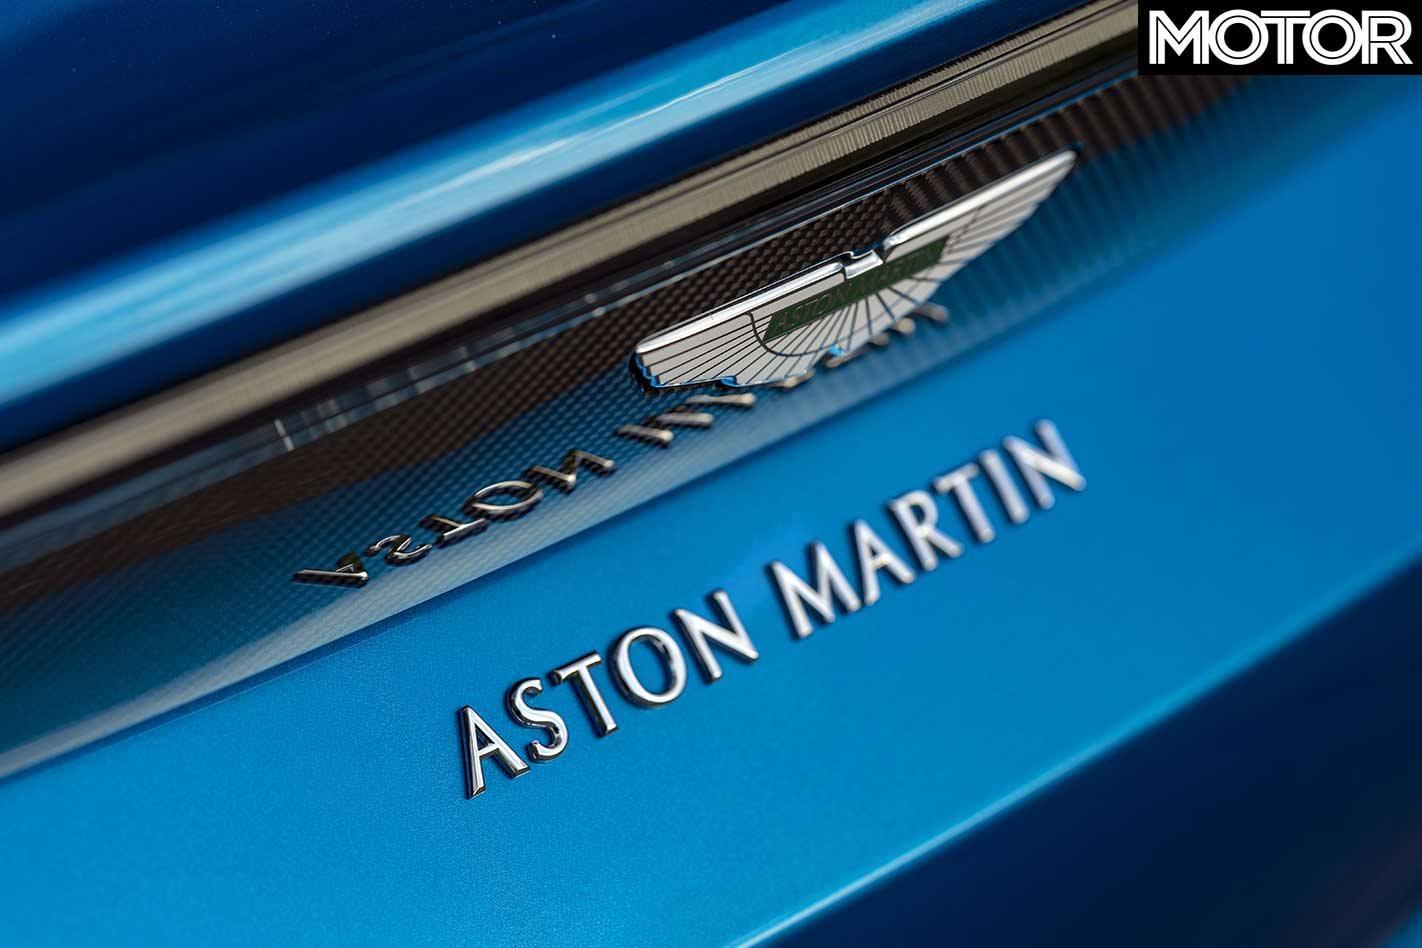 Aston Martin Vantage Manual 2019 Review